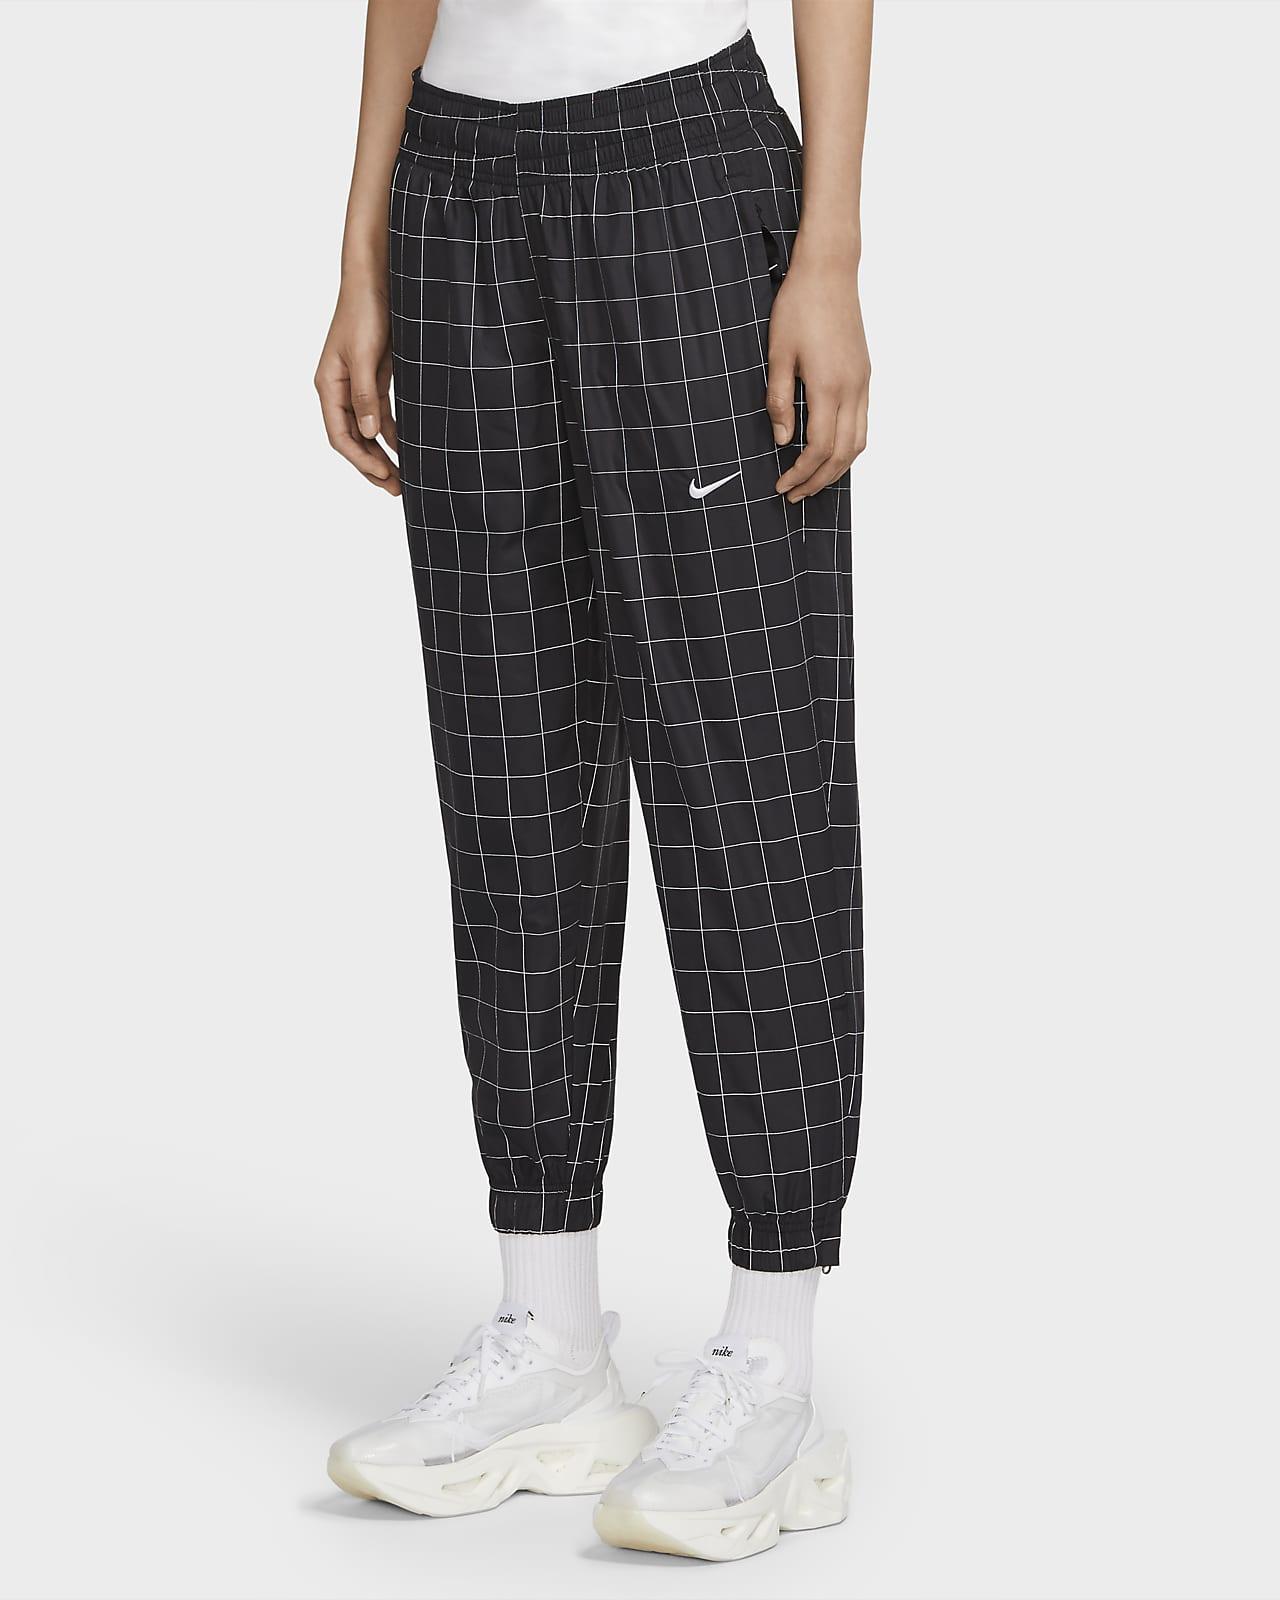 NikeLab Women's Flash Track Pants